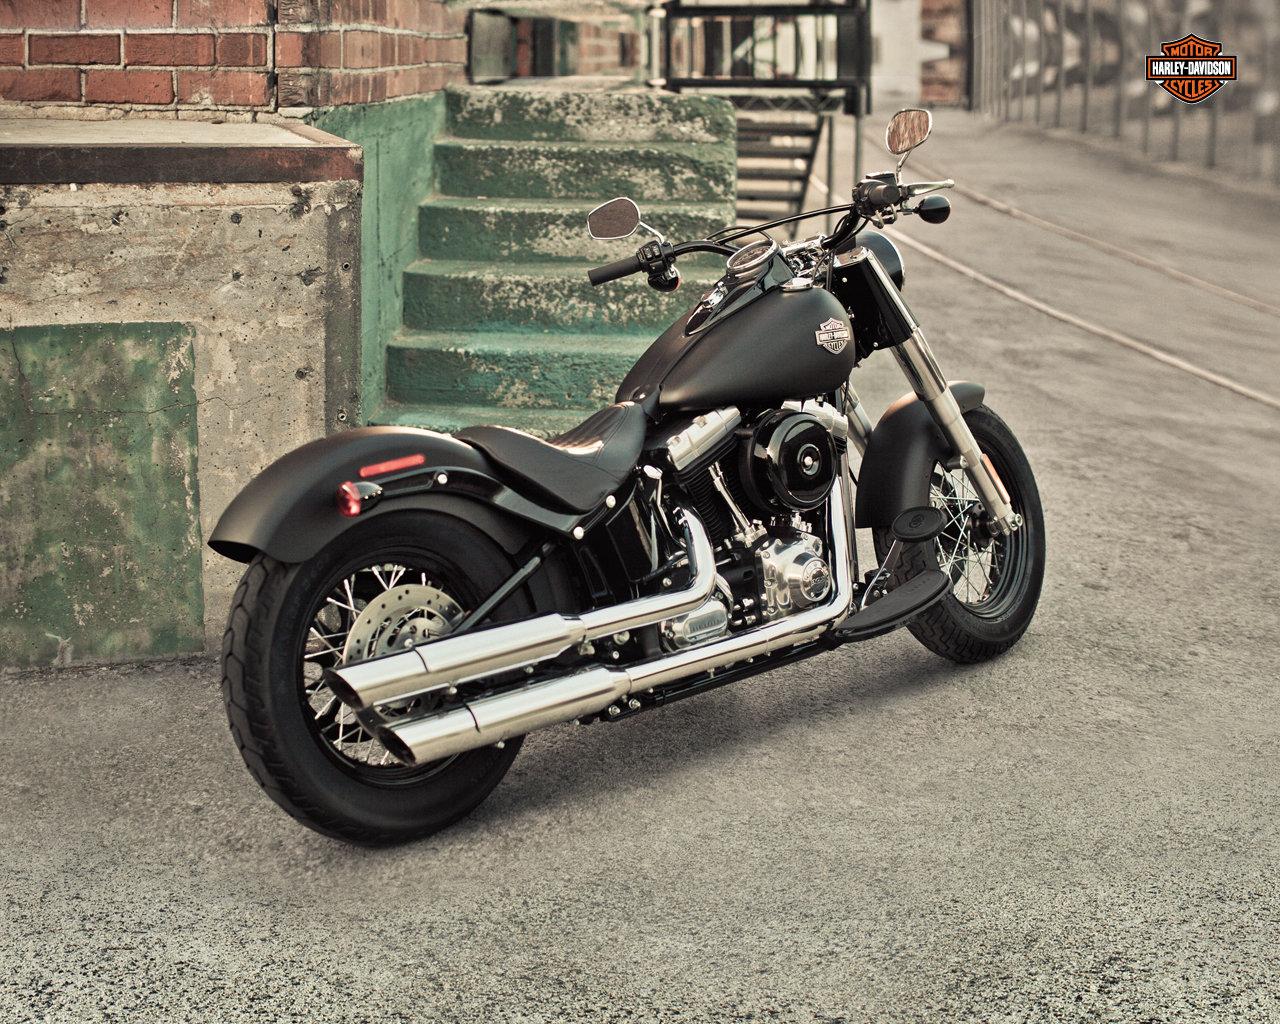 Best Harley Davidson Wallpaper ID:478080 For High Resolution Hd 1280x1024  Desktop